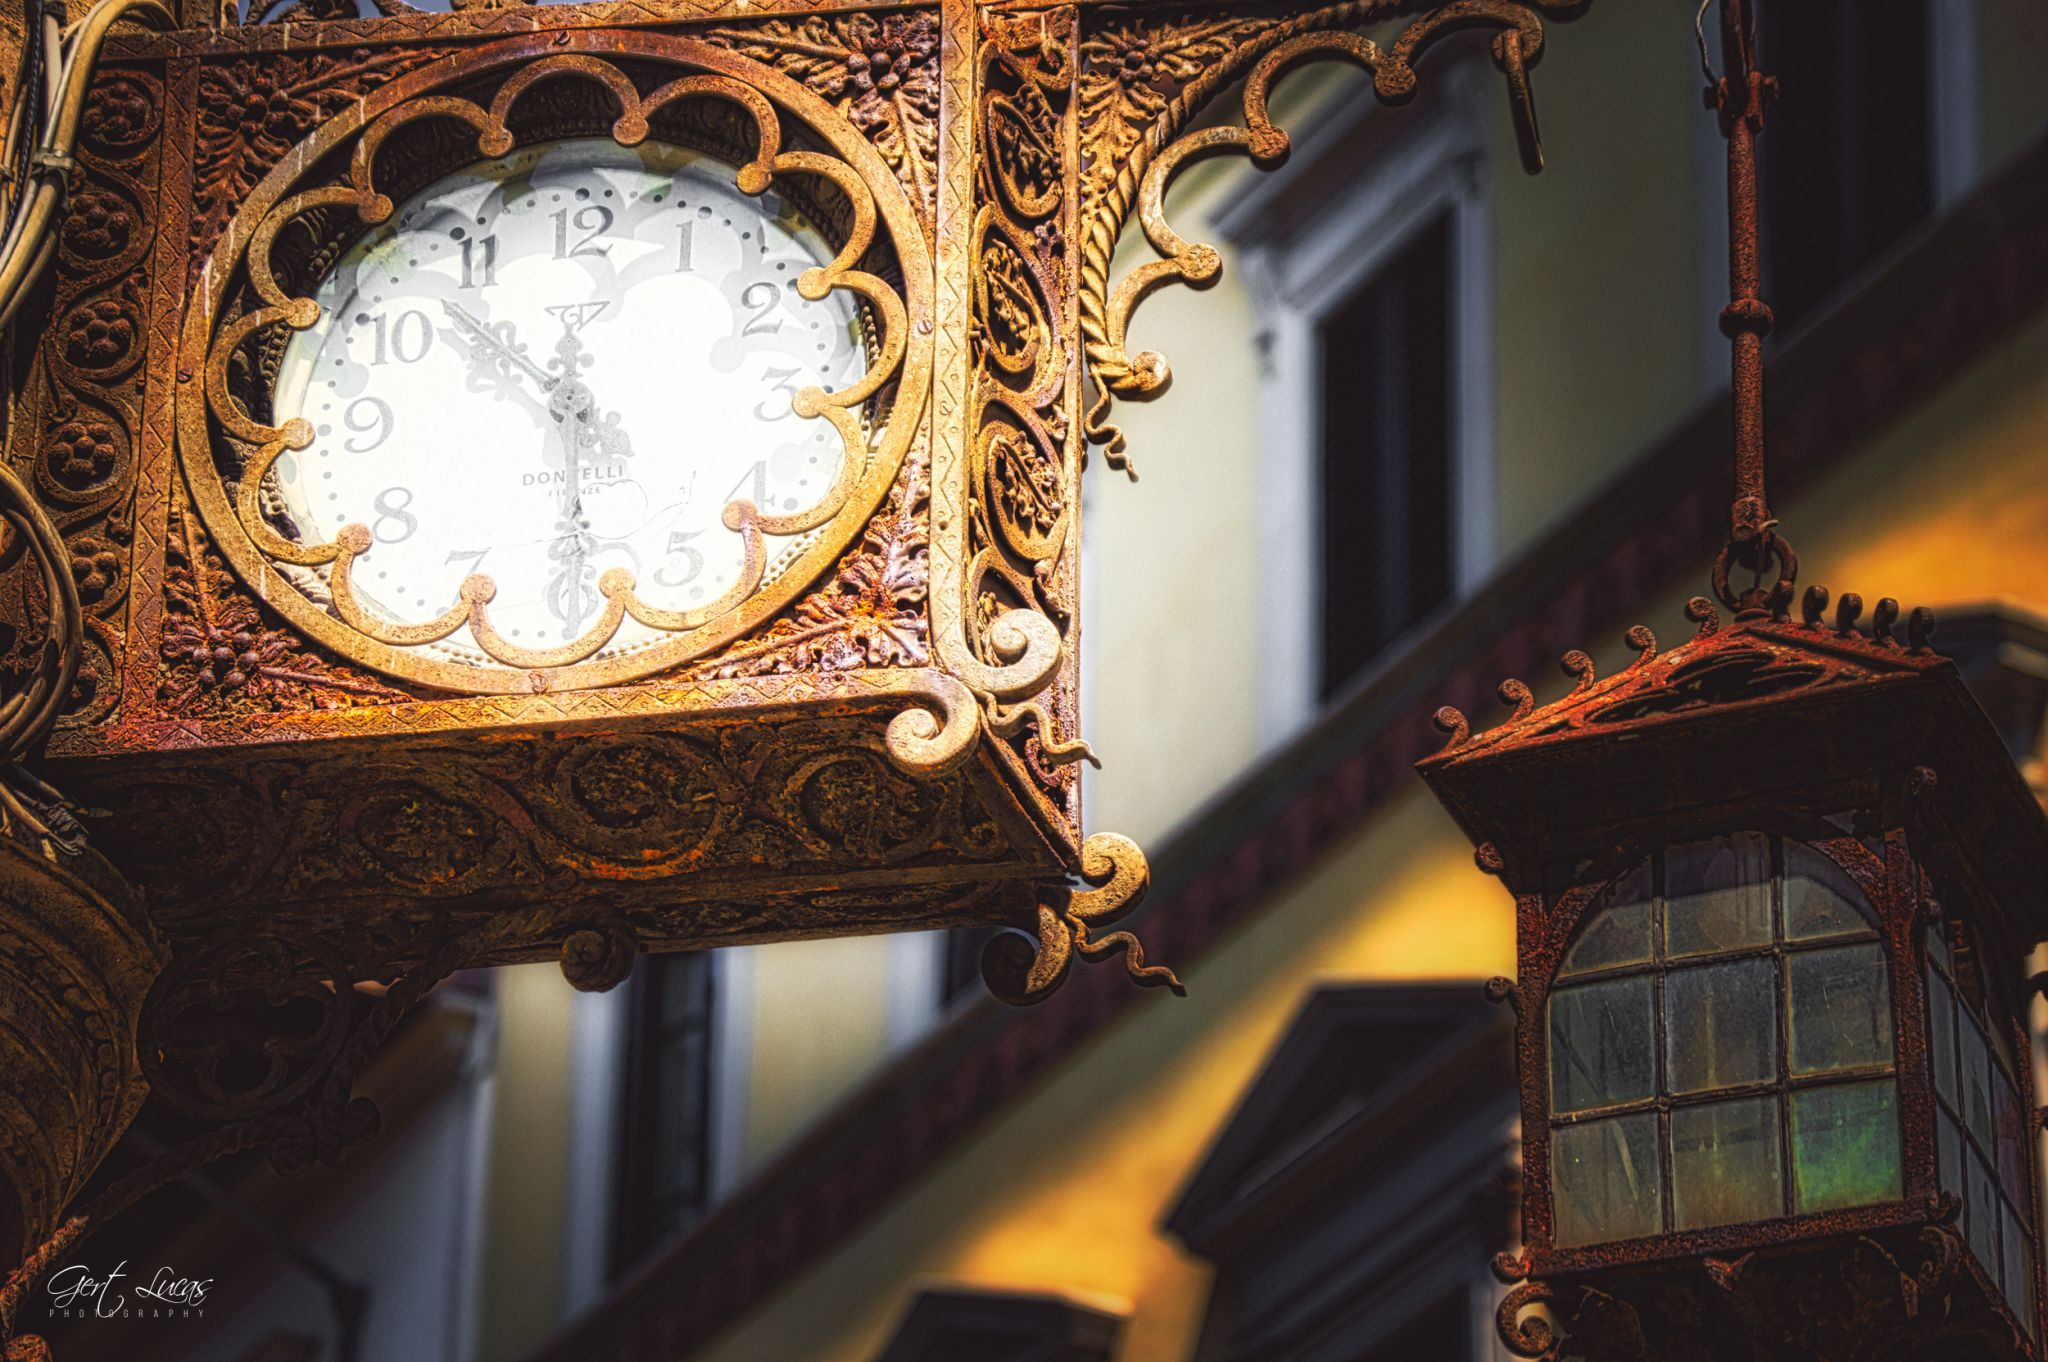 Firenze - Clockwork, Italy